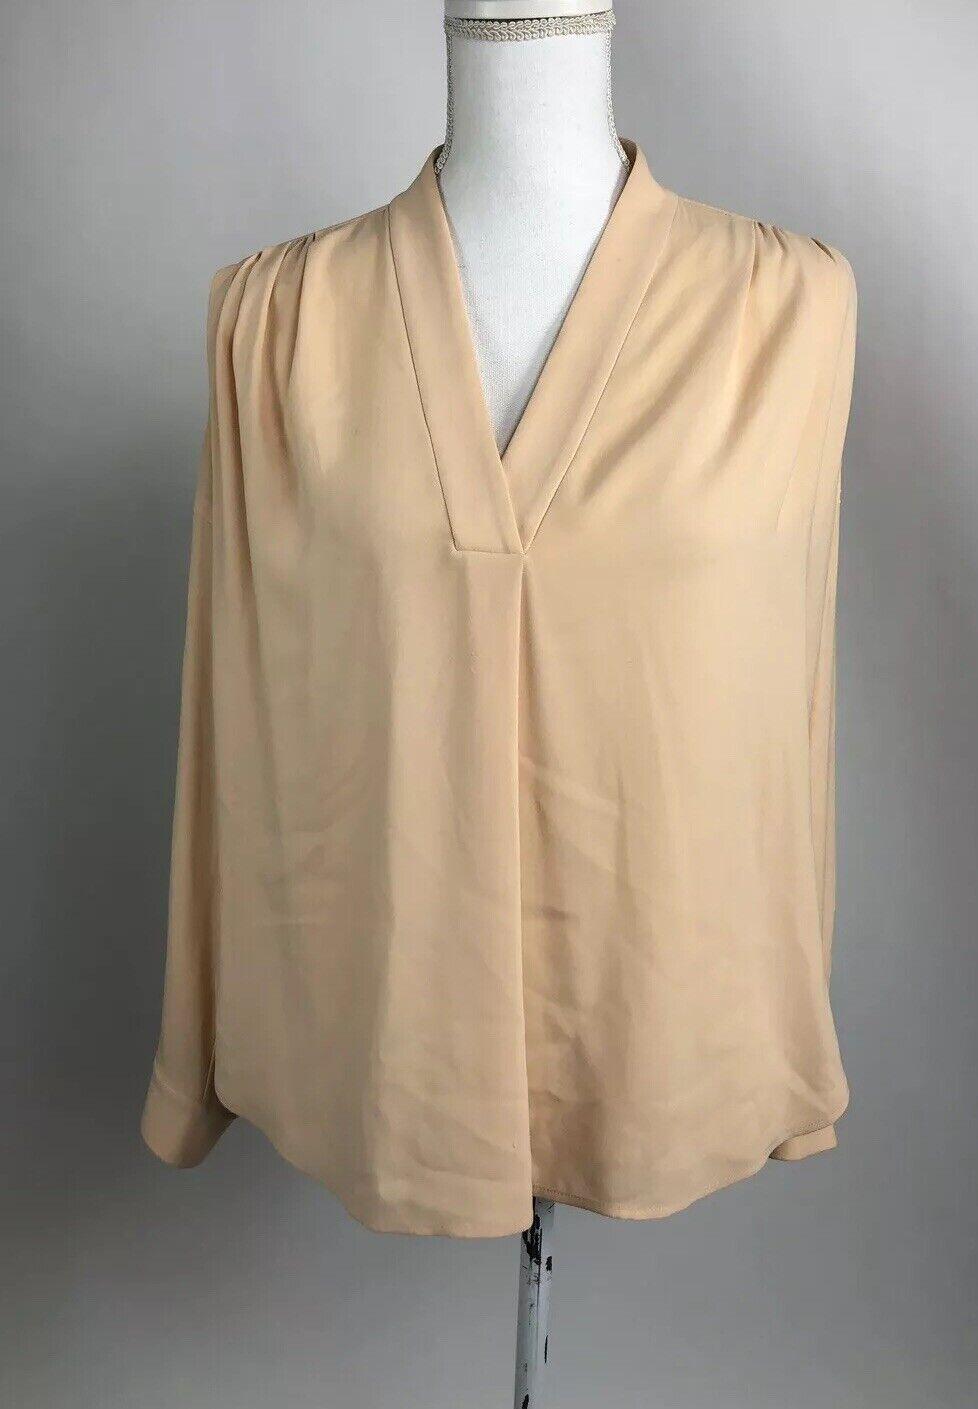 Mm lafleur Long Sleeve Tunic High Low Peach Farbe Größe Small S Blouse